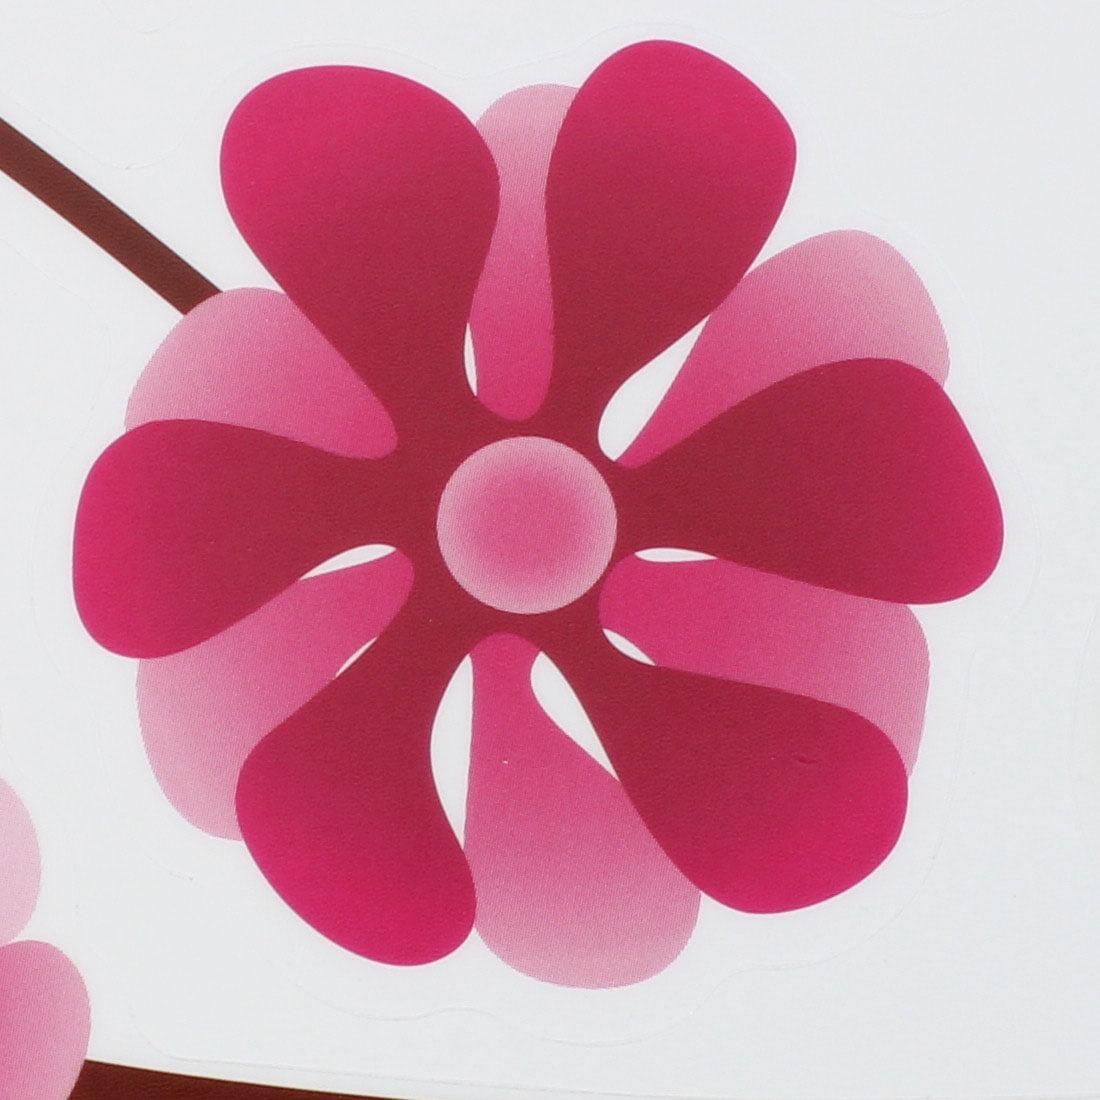 Pink Purple Dandelion Flower Wall Sticker Mural Room Decor - image 3 of 4